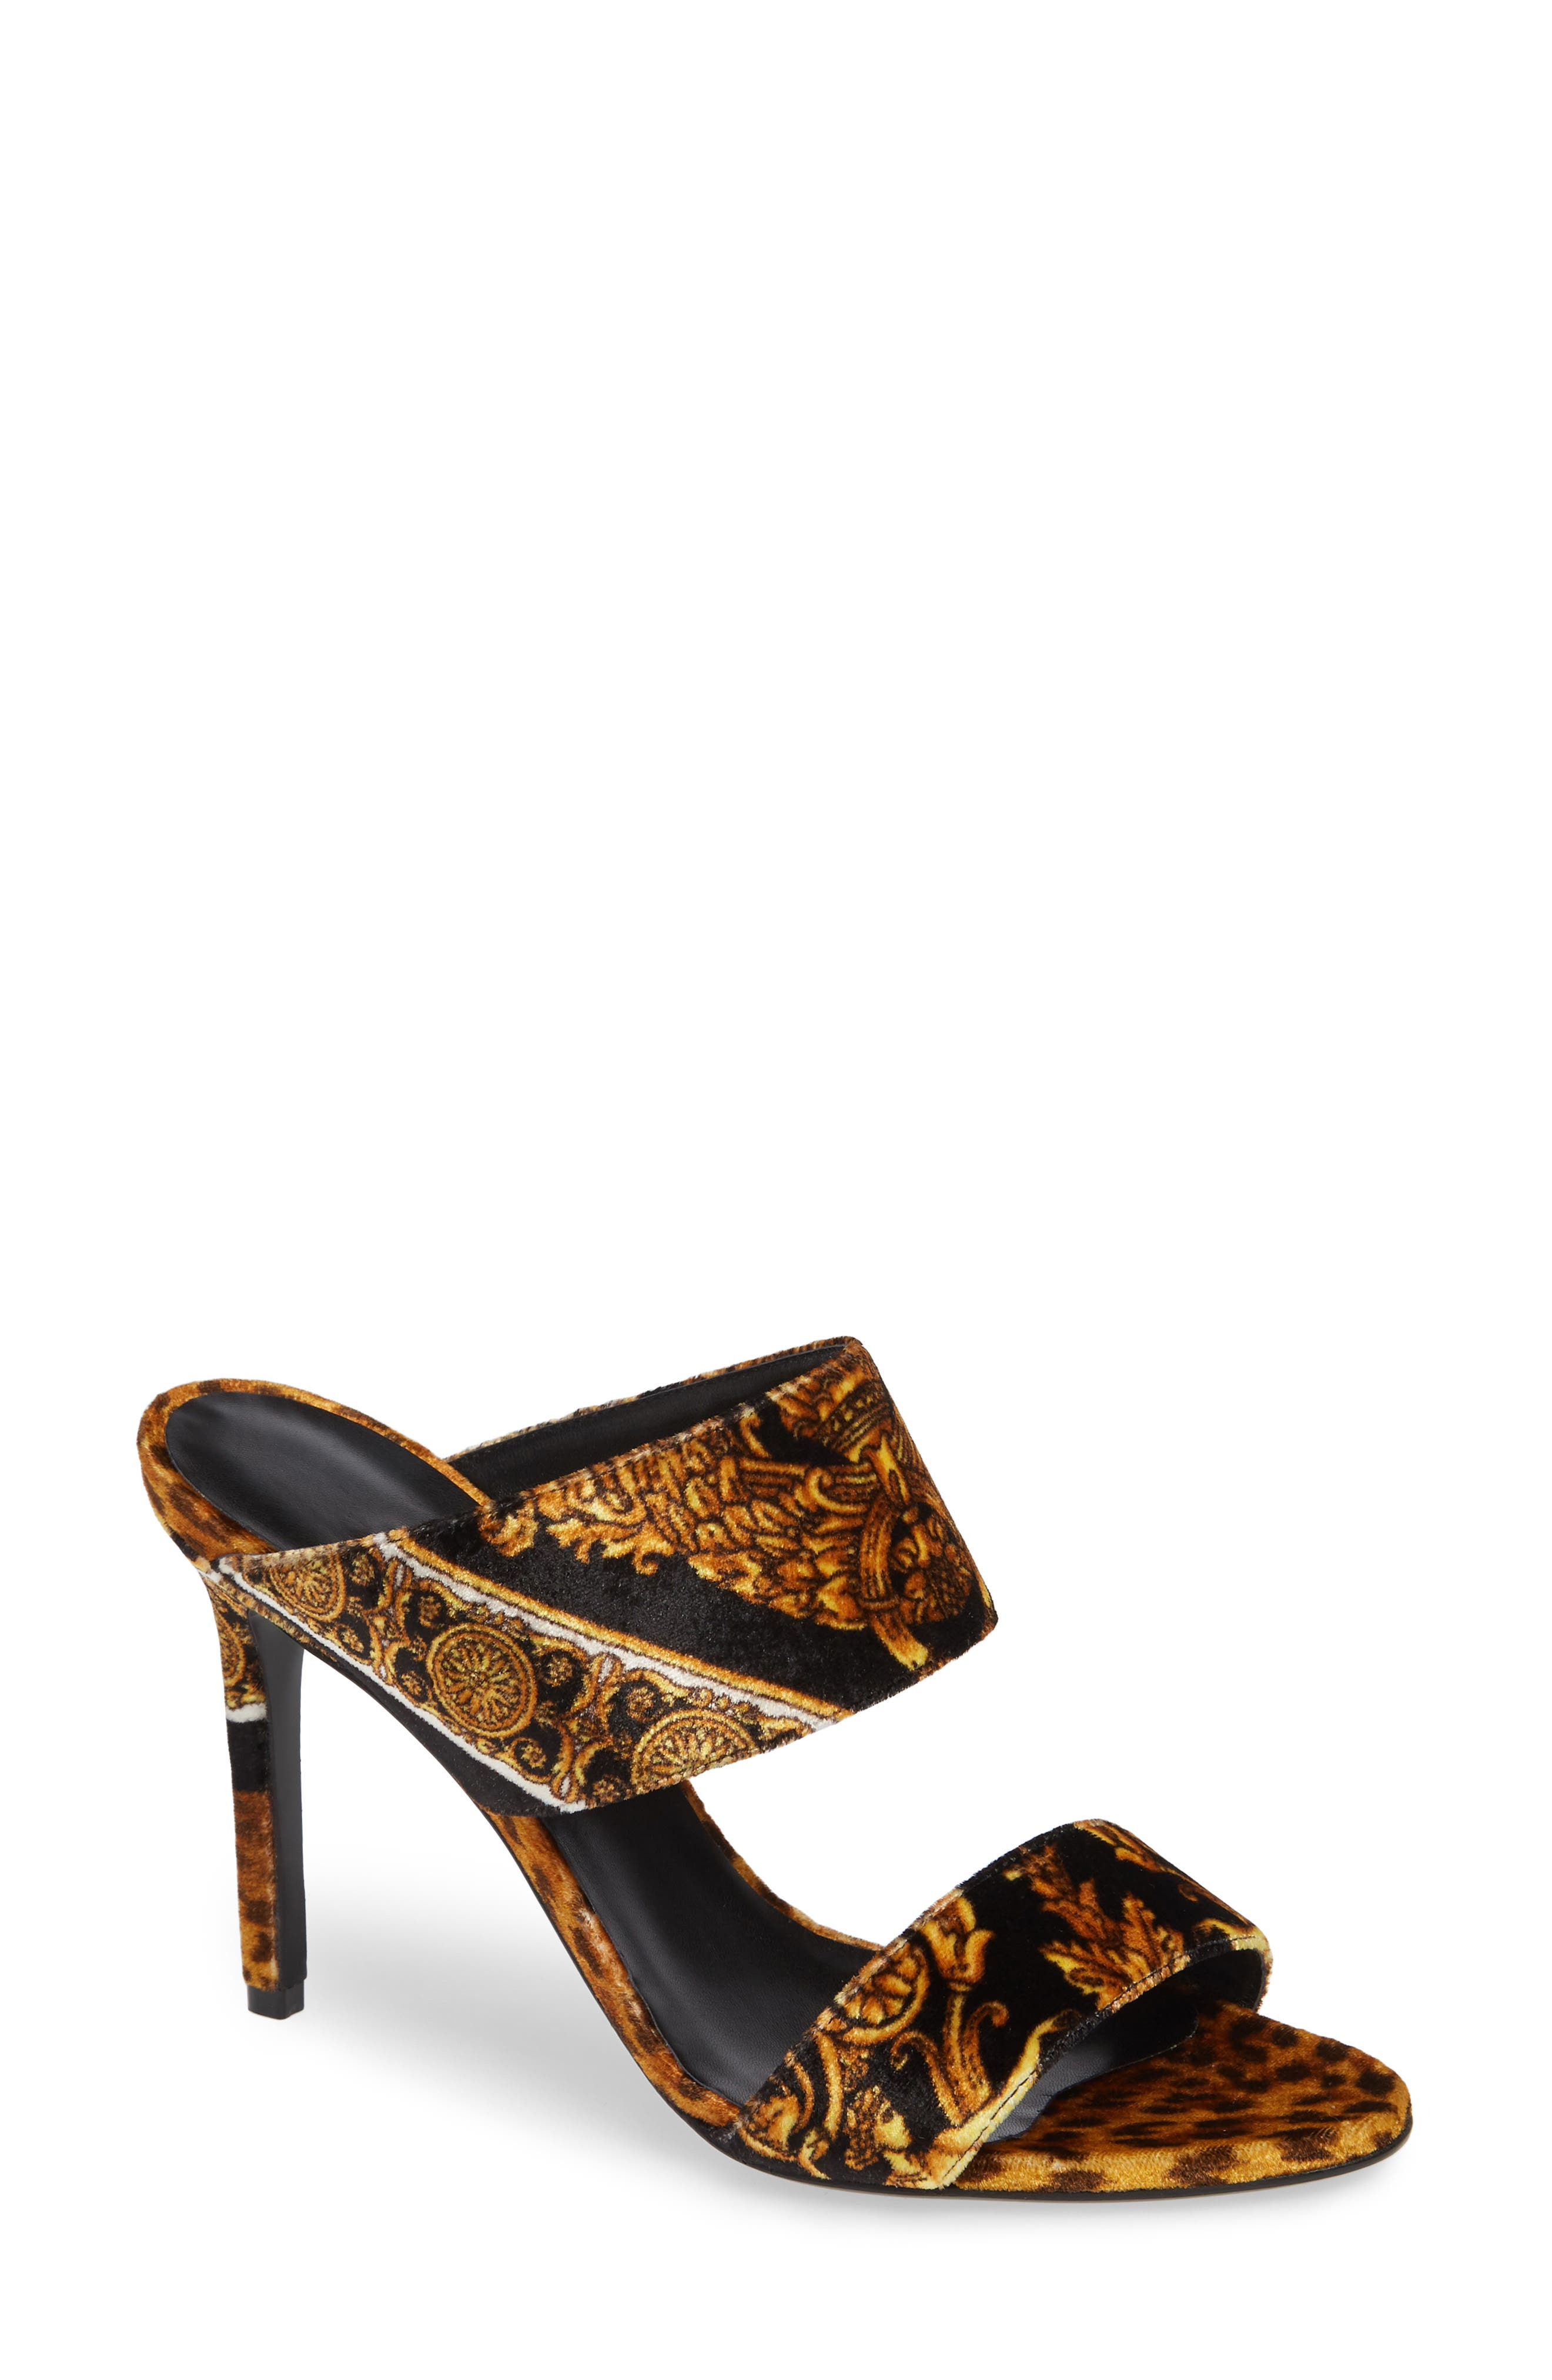 7c517ffd63df Women s Versace Sandals